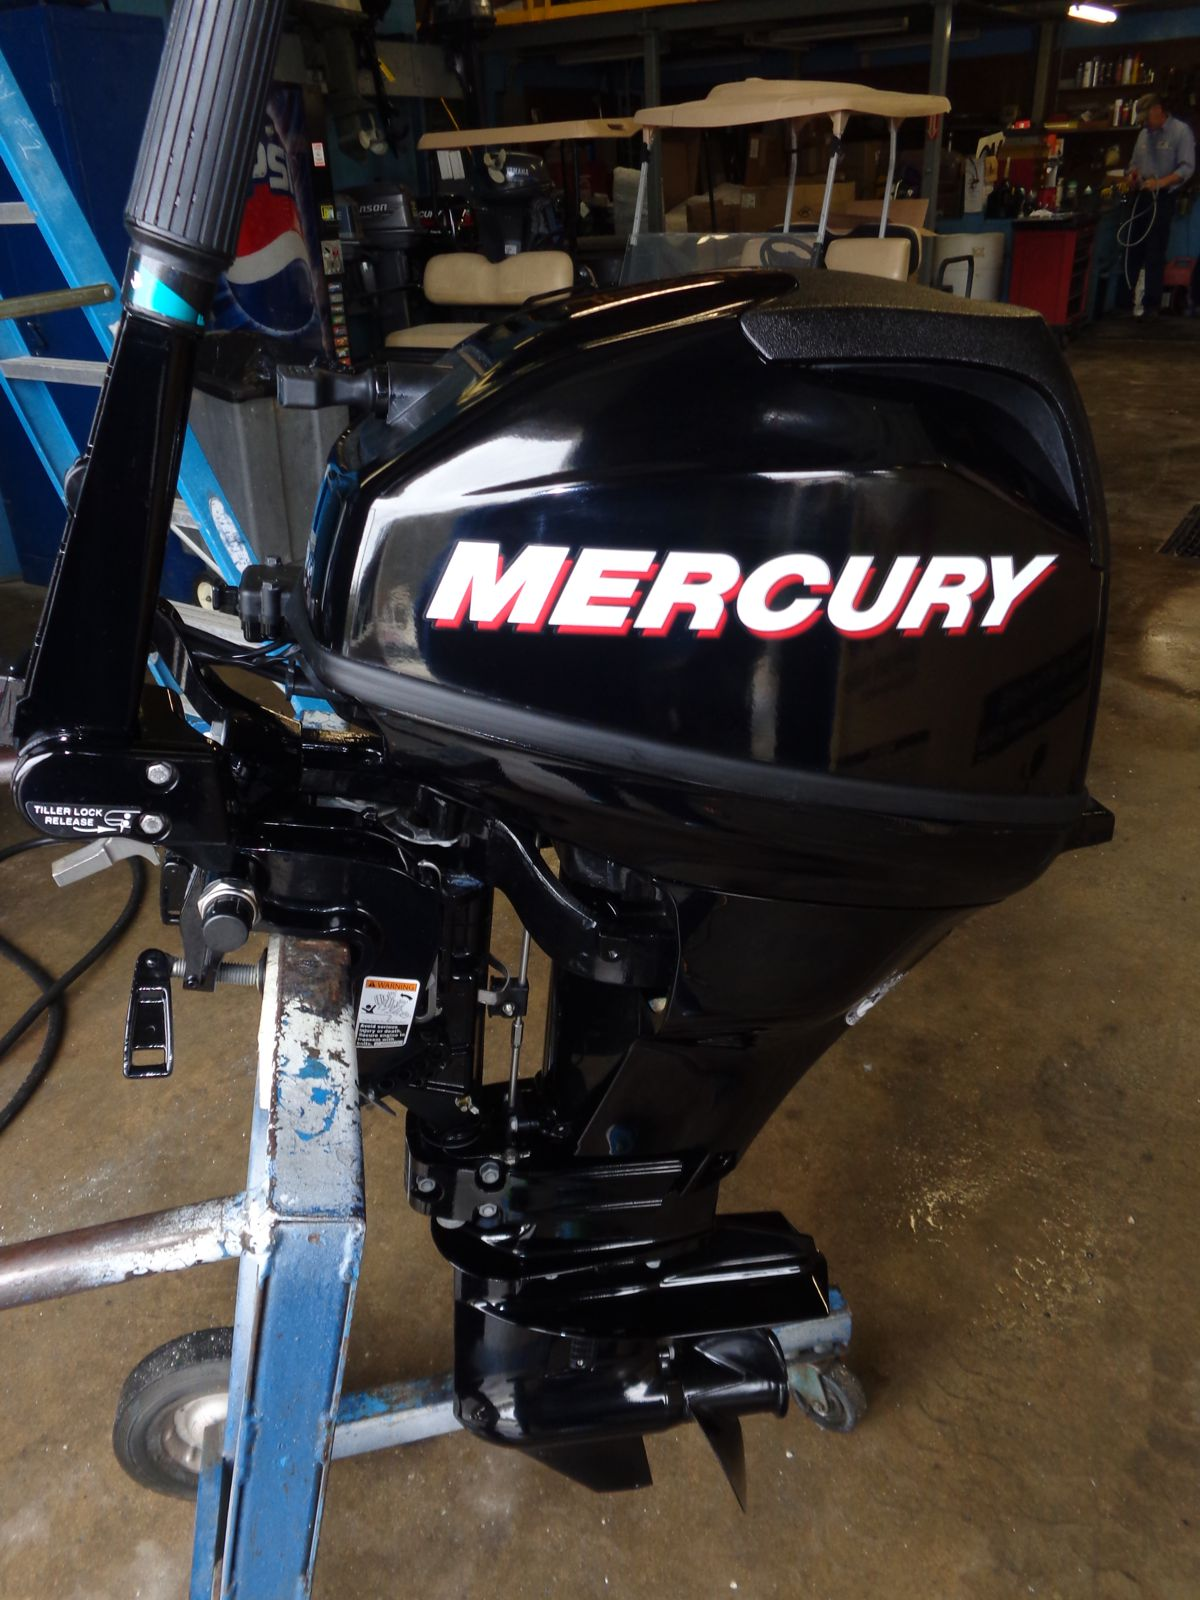 Mercury 15 hp boat parts ebay electronics cars html for Mercury boat motor parts on ebay